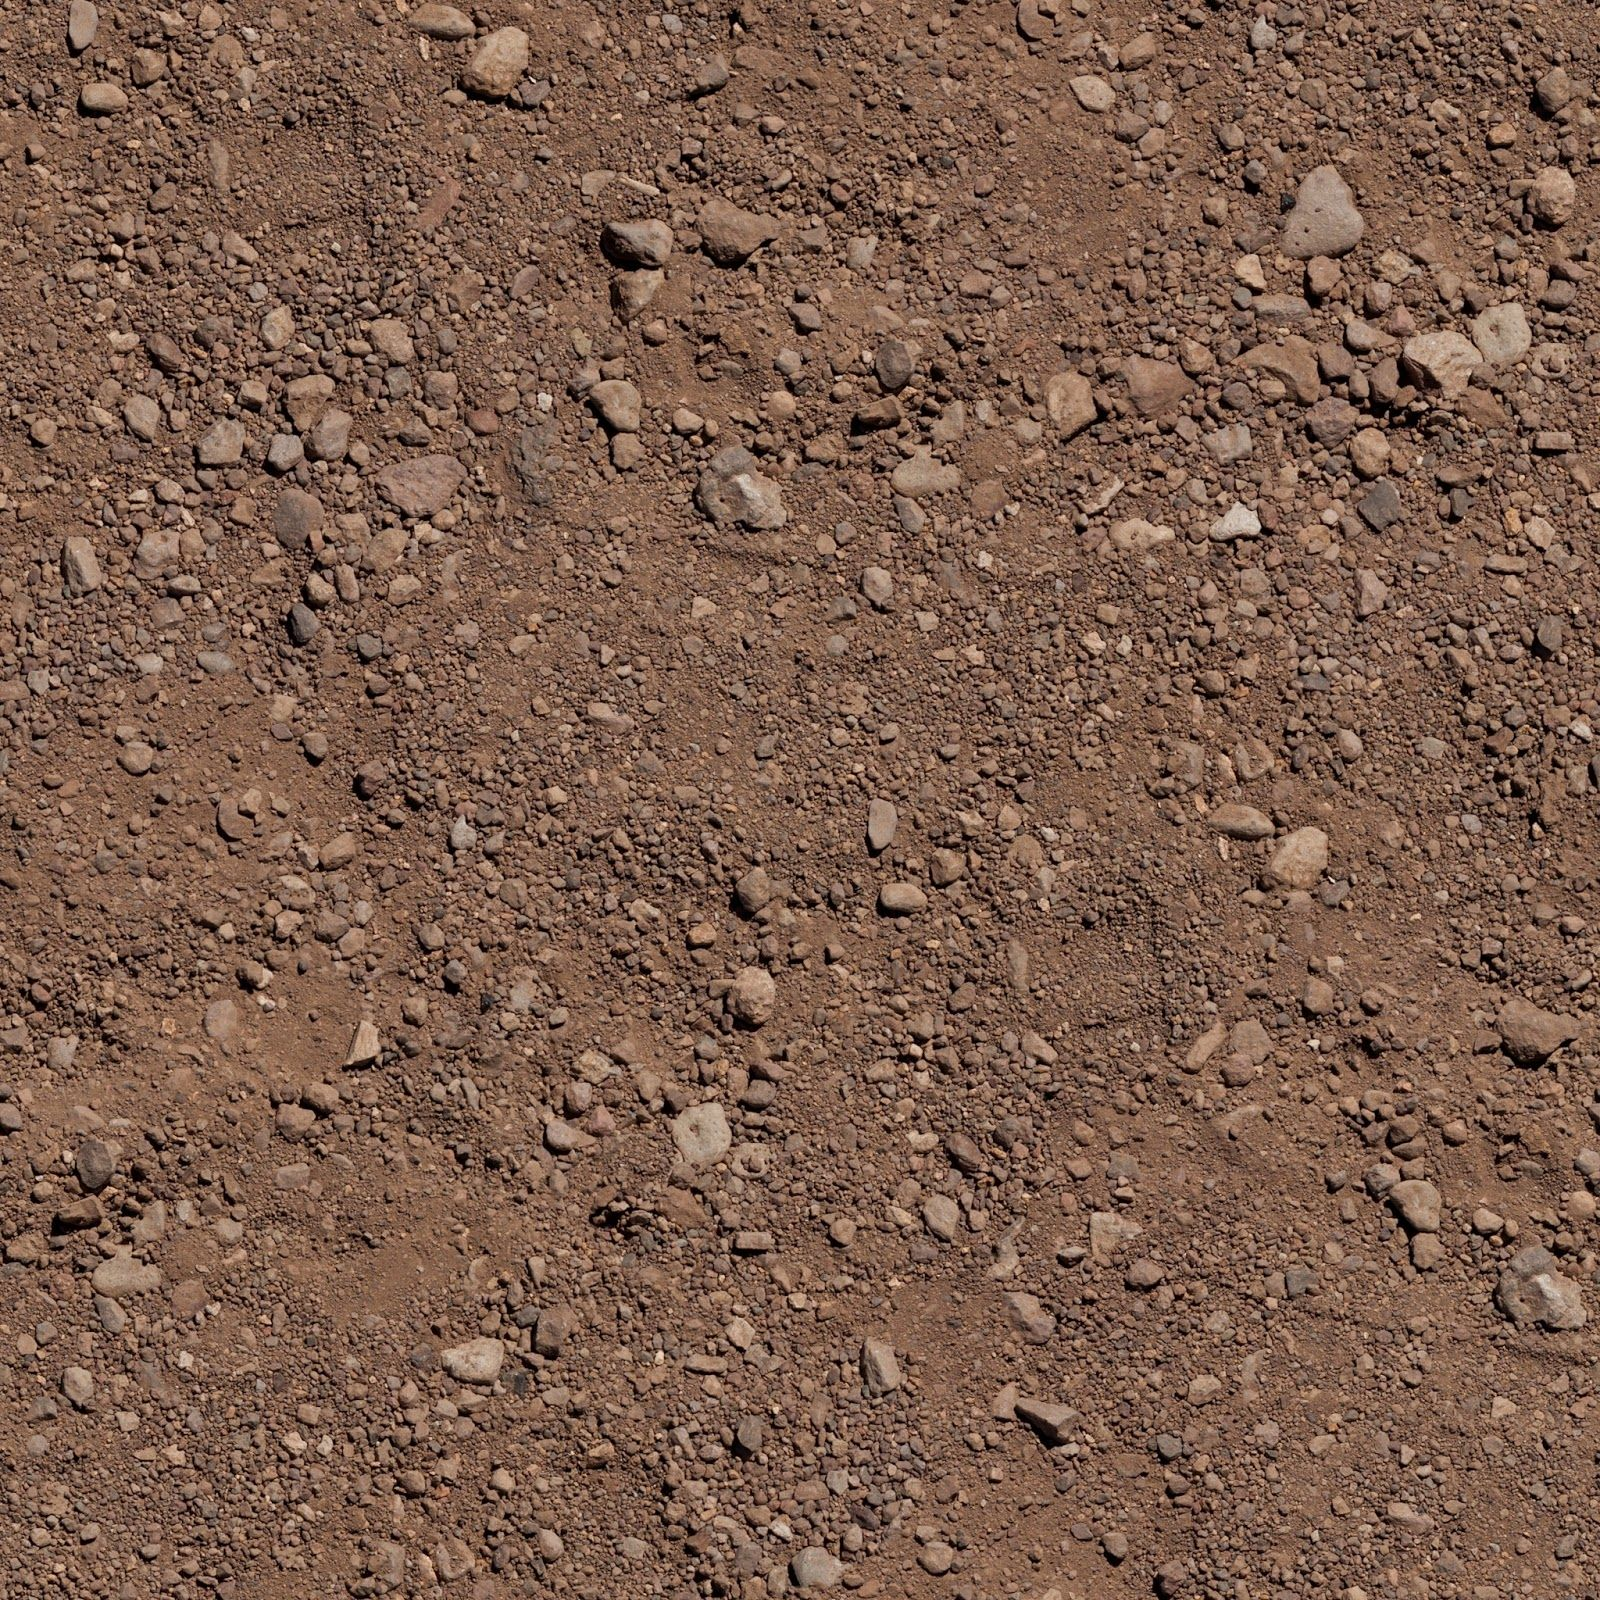 Textures architecture roads roads dirt road texture seamless - Ground Texture Seamless Google